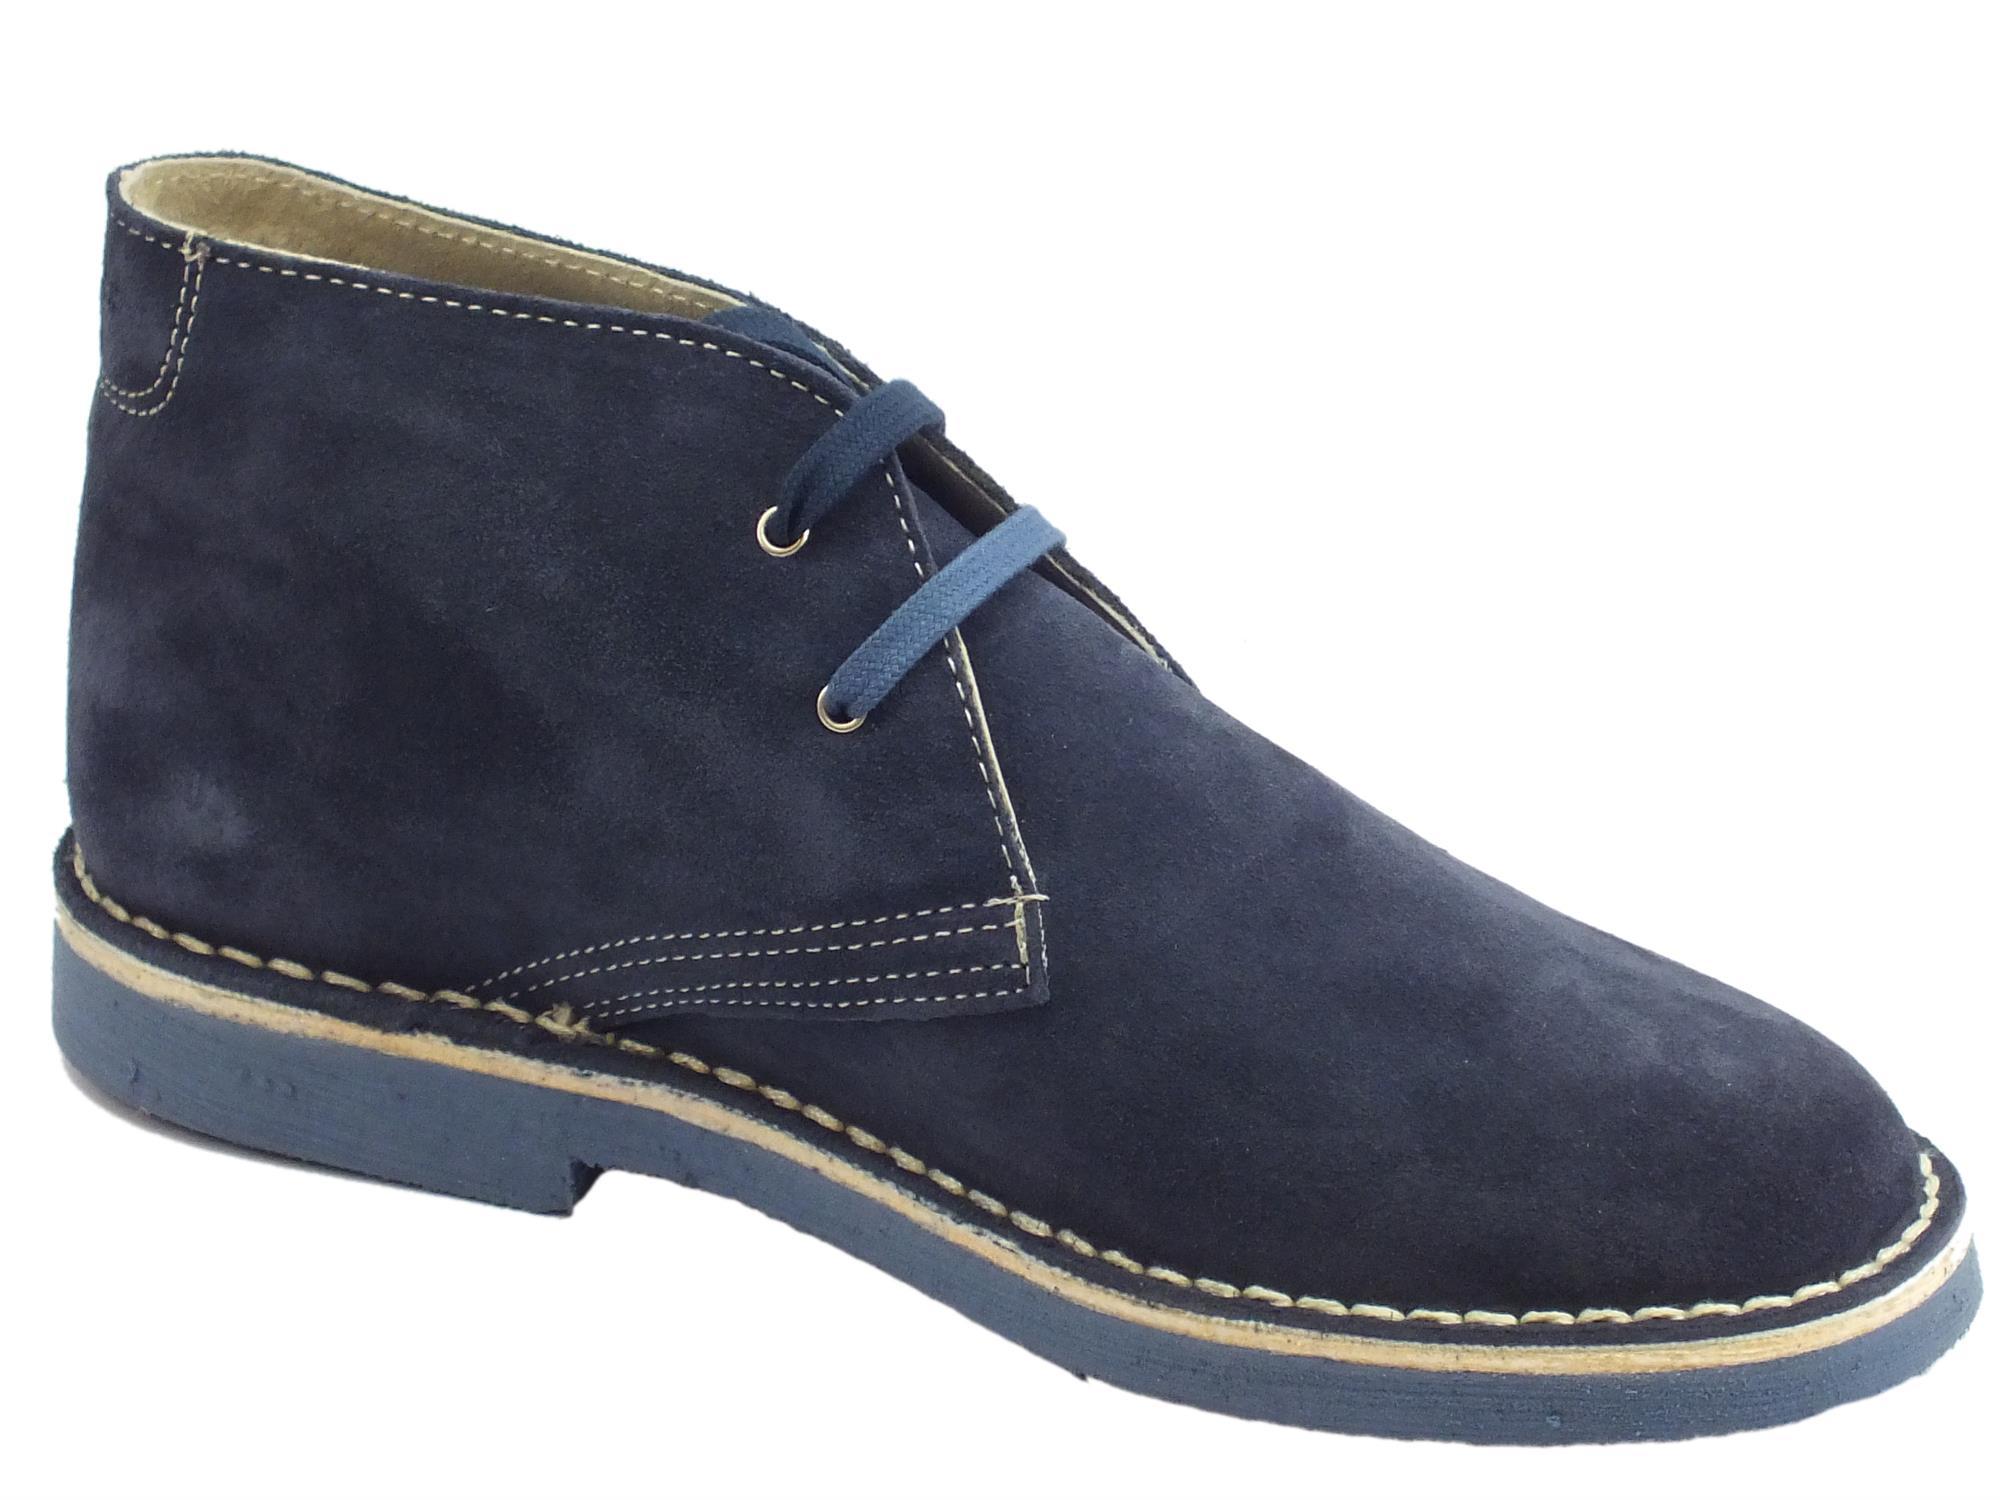 ... Lumberjack Gable scarpe polacchine uomo in camoscio jeans ed avio ... 2343d5ccac3